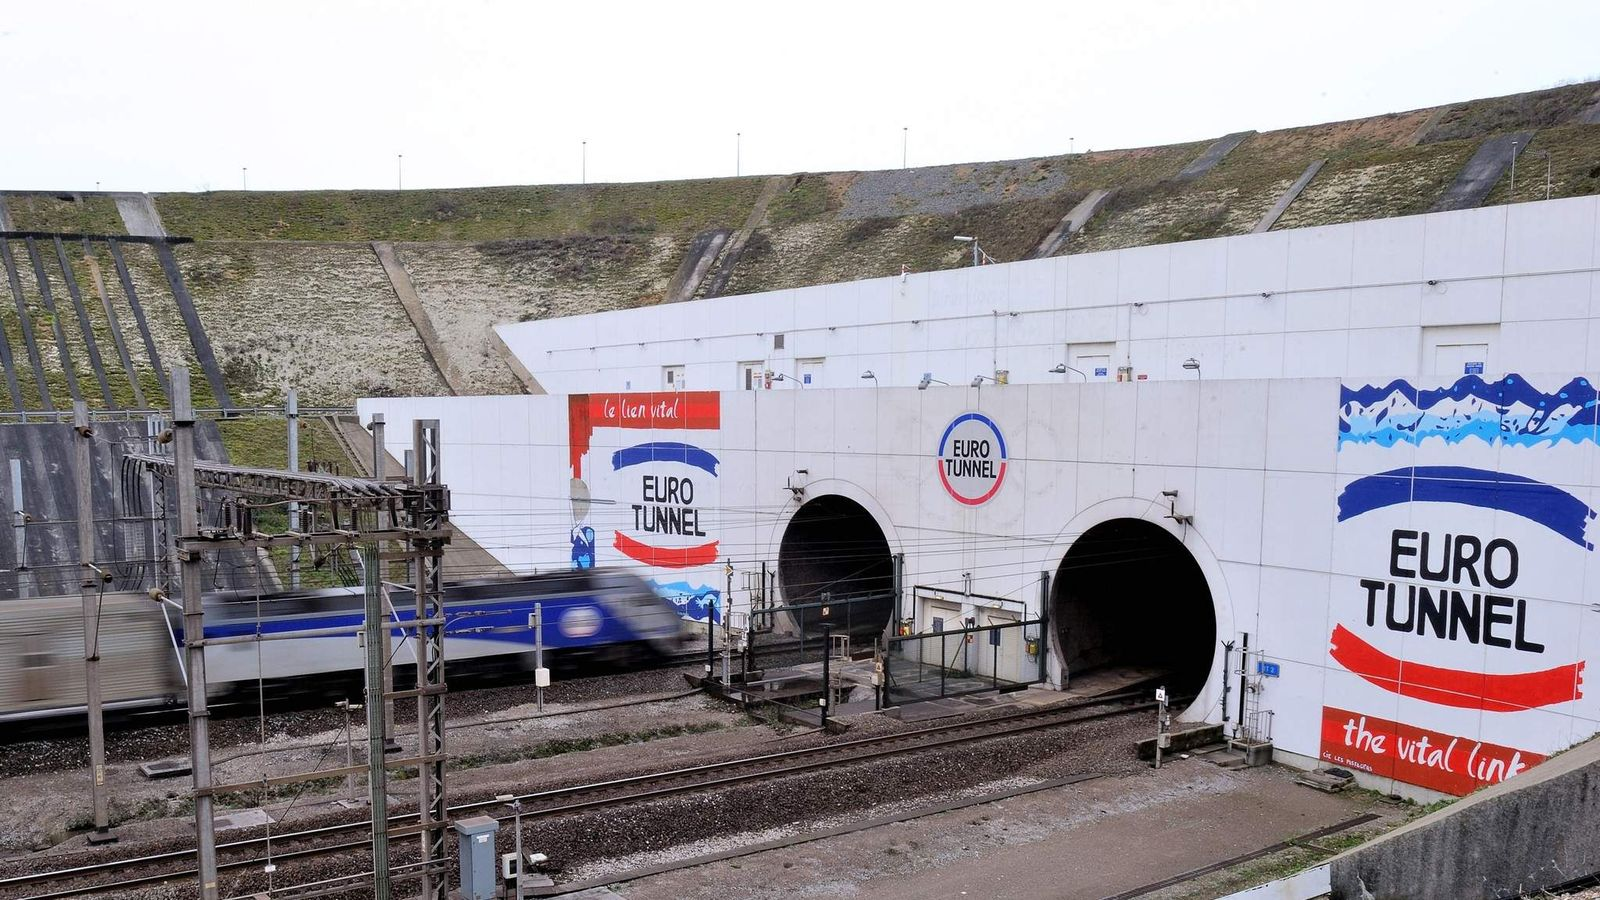 migrant  u0026 39 invasion u0026 39  halts channel tunnel trains